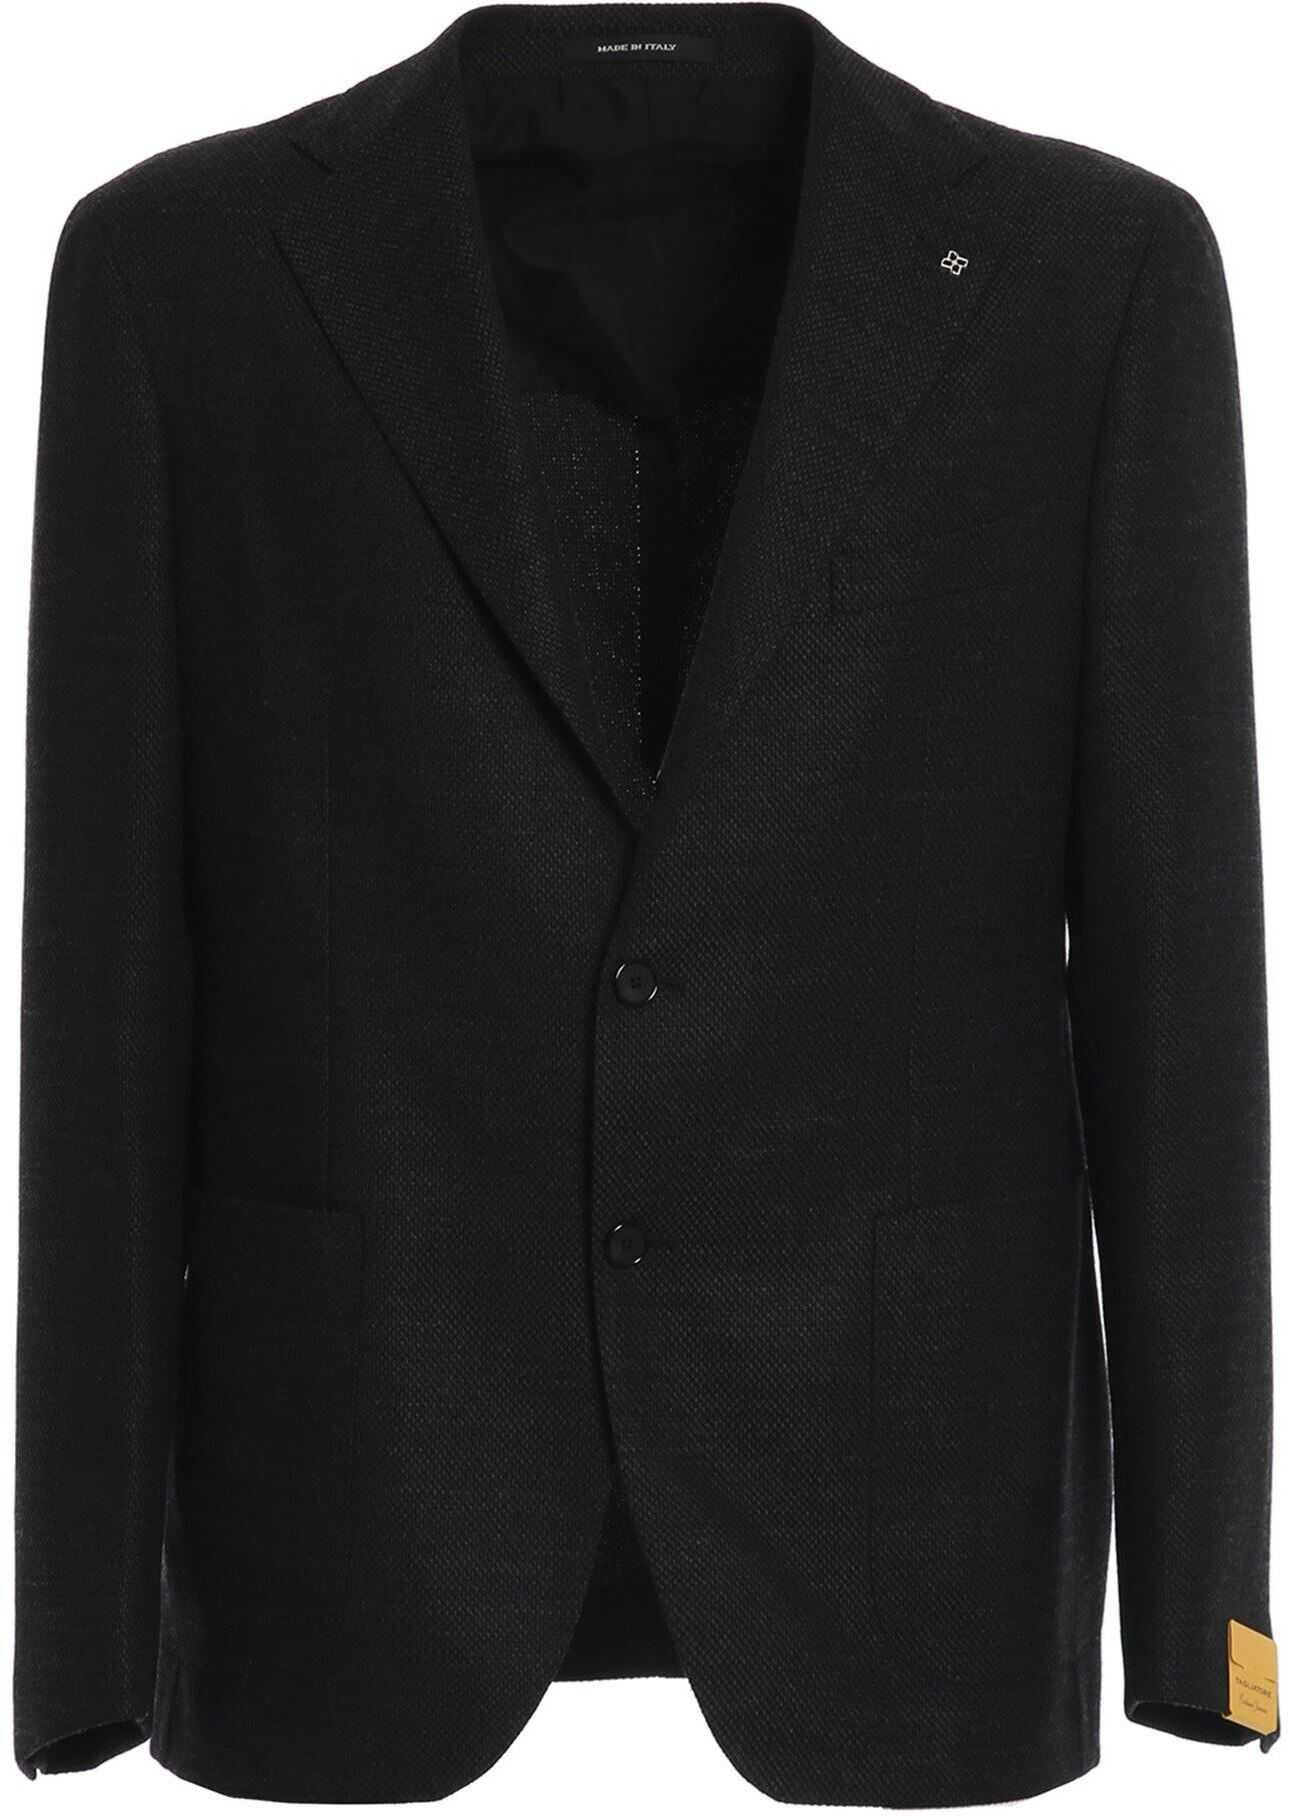 Tagliatore Virgin Wool Blazer In Black Black imagine